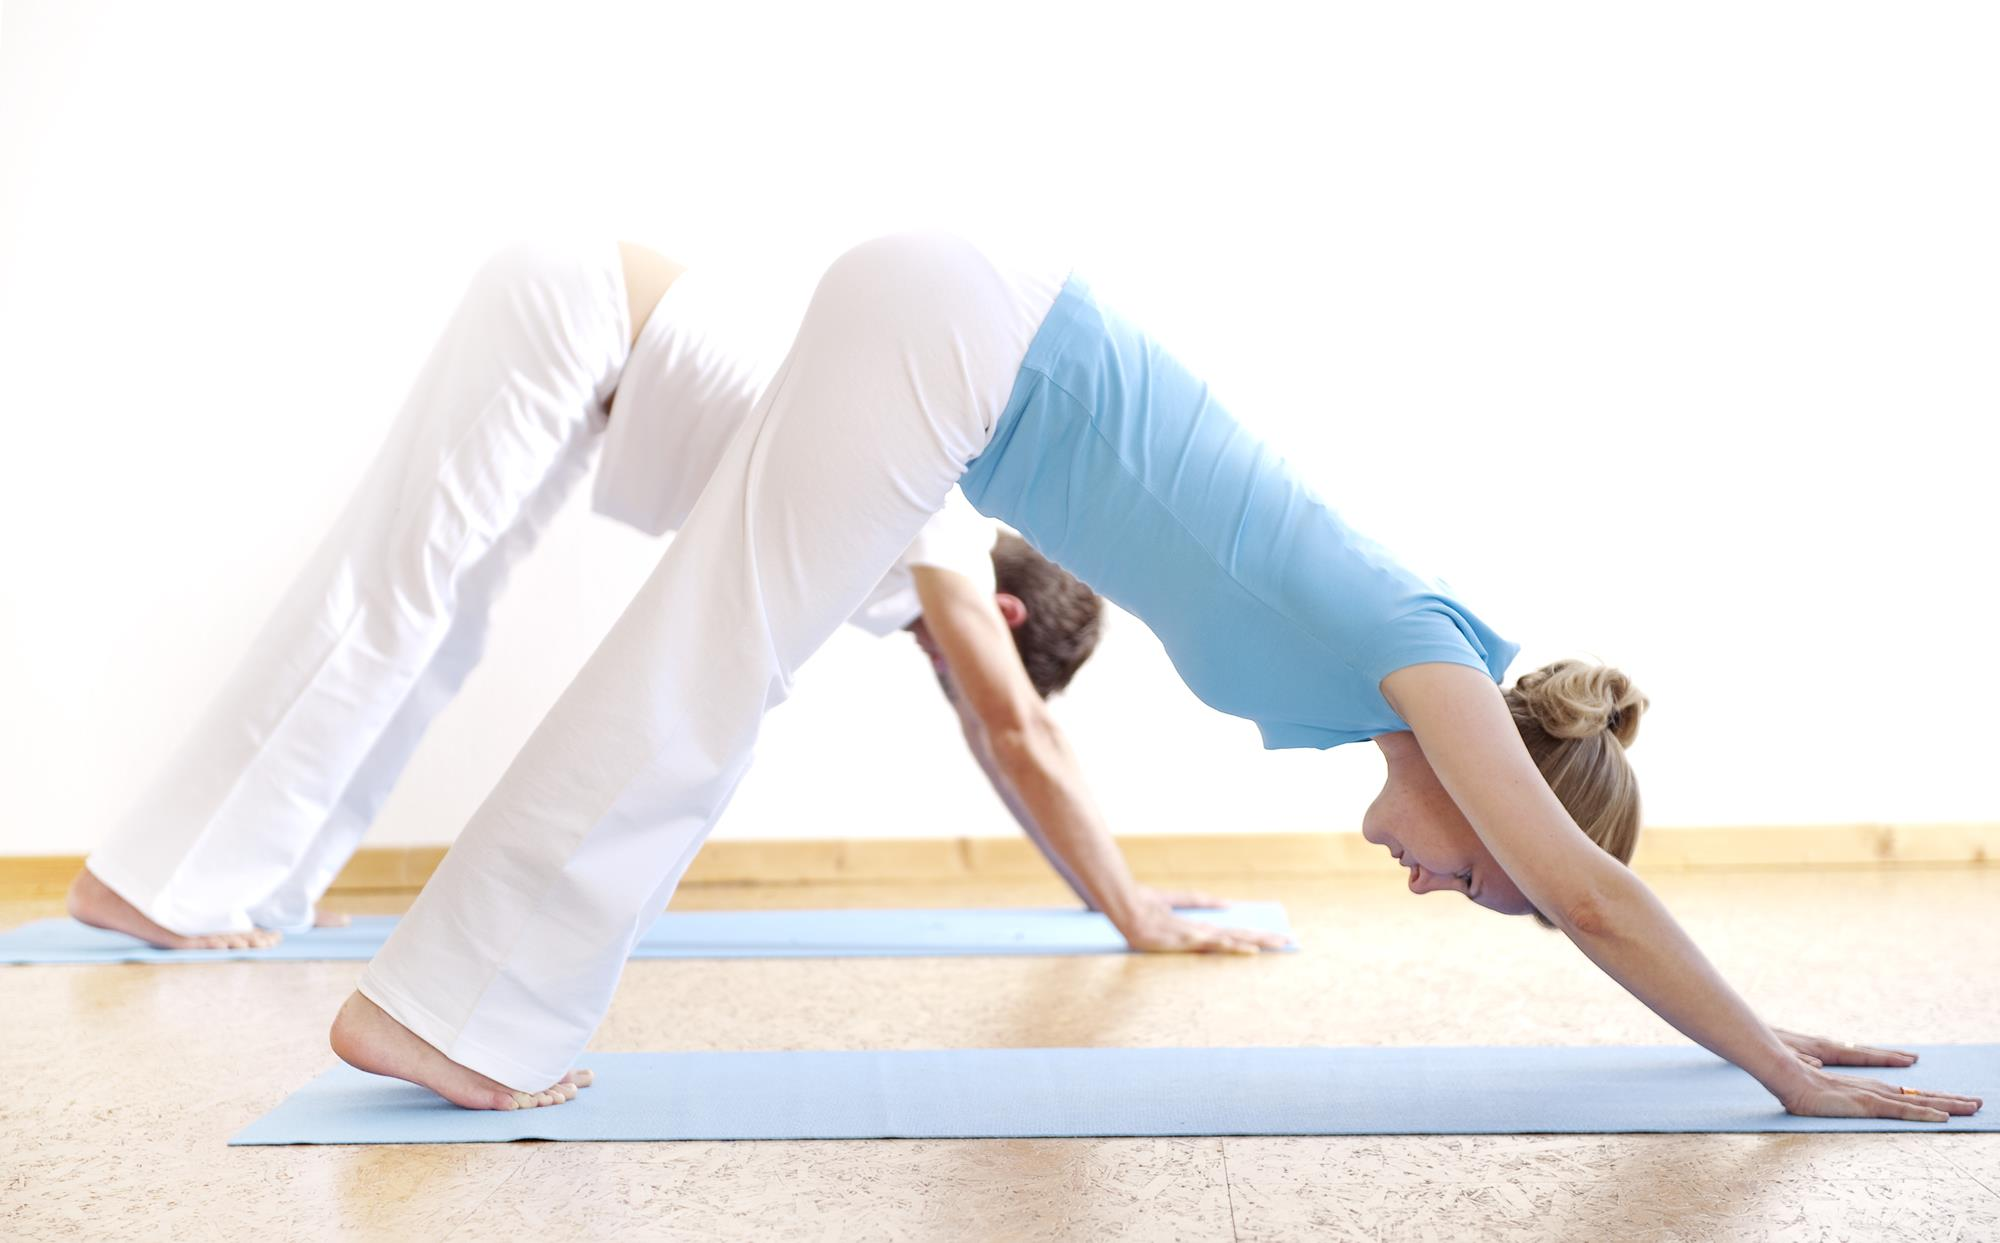 Sri Sri Yoga Der Weg In Ein Stressfreies Leben Wainando Travel